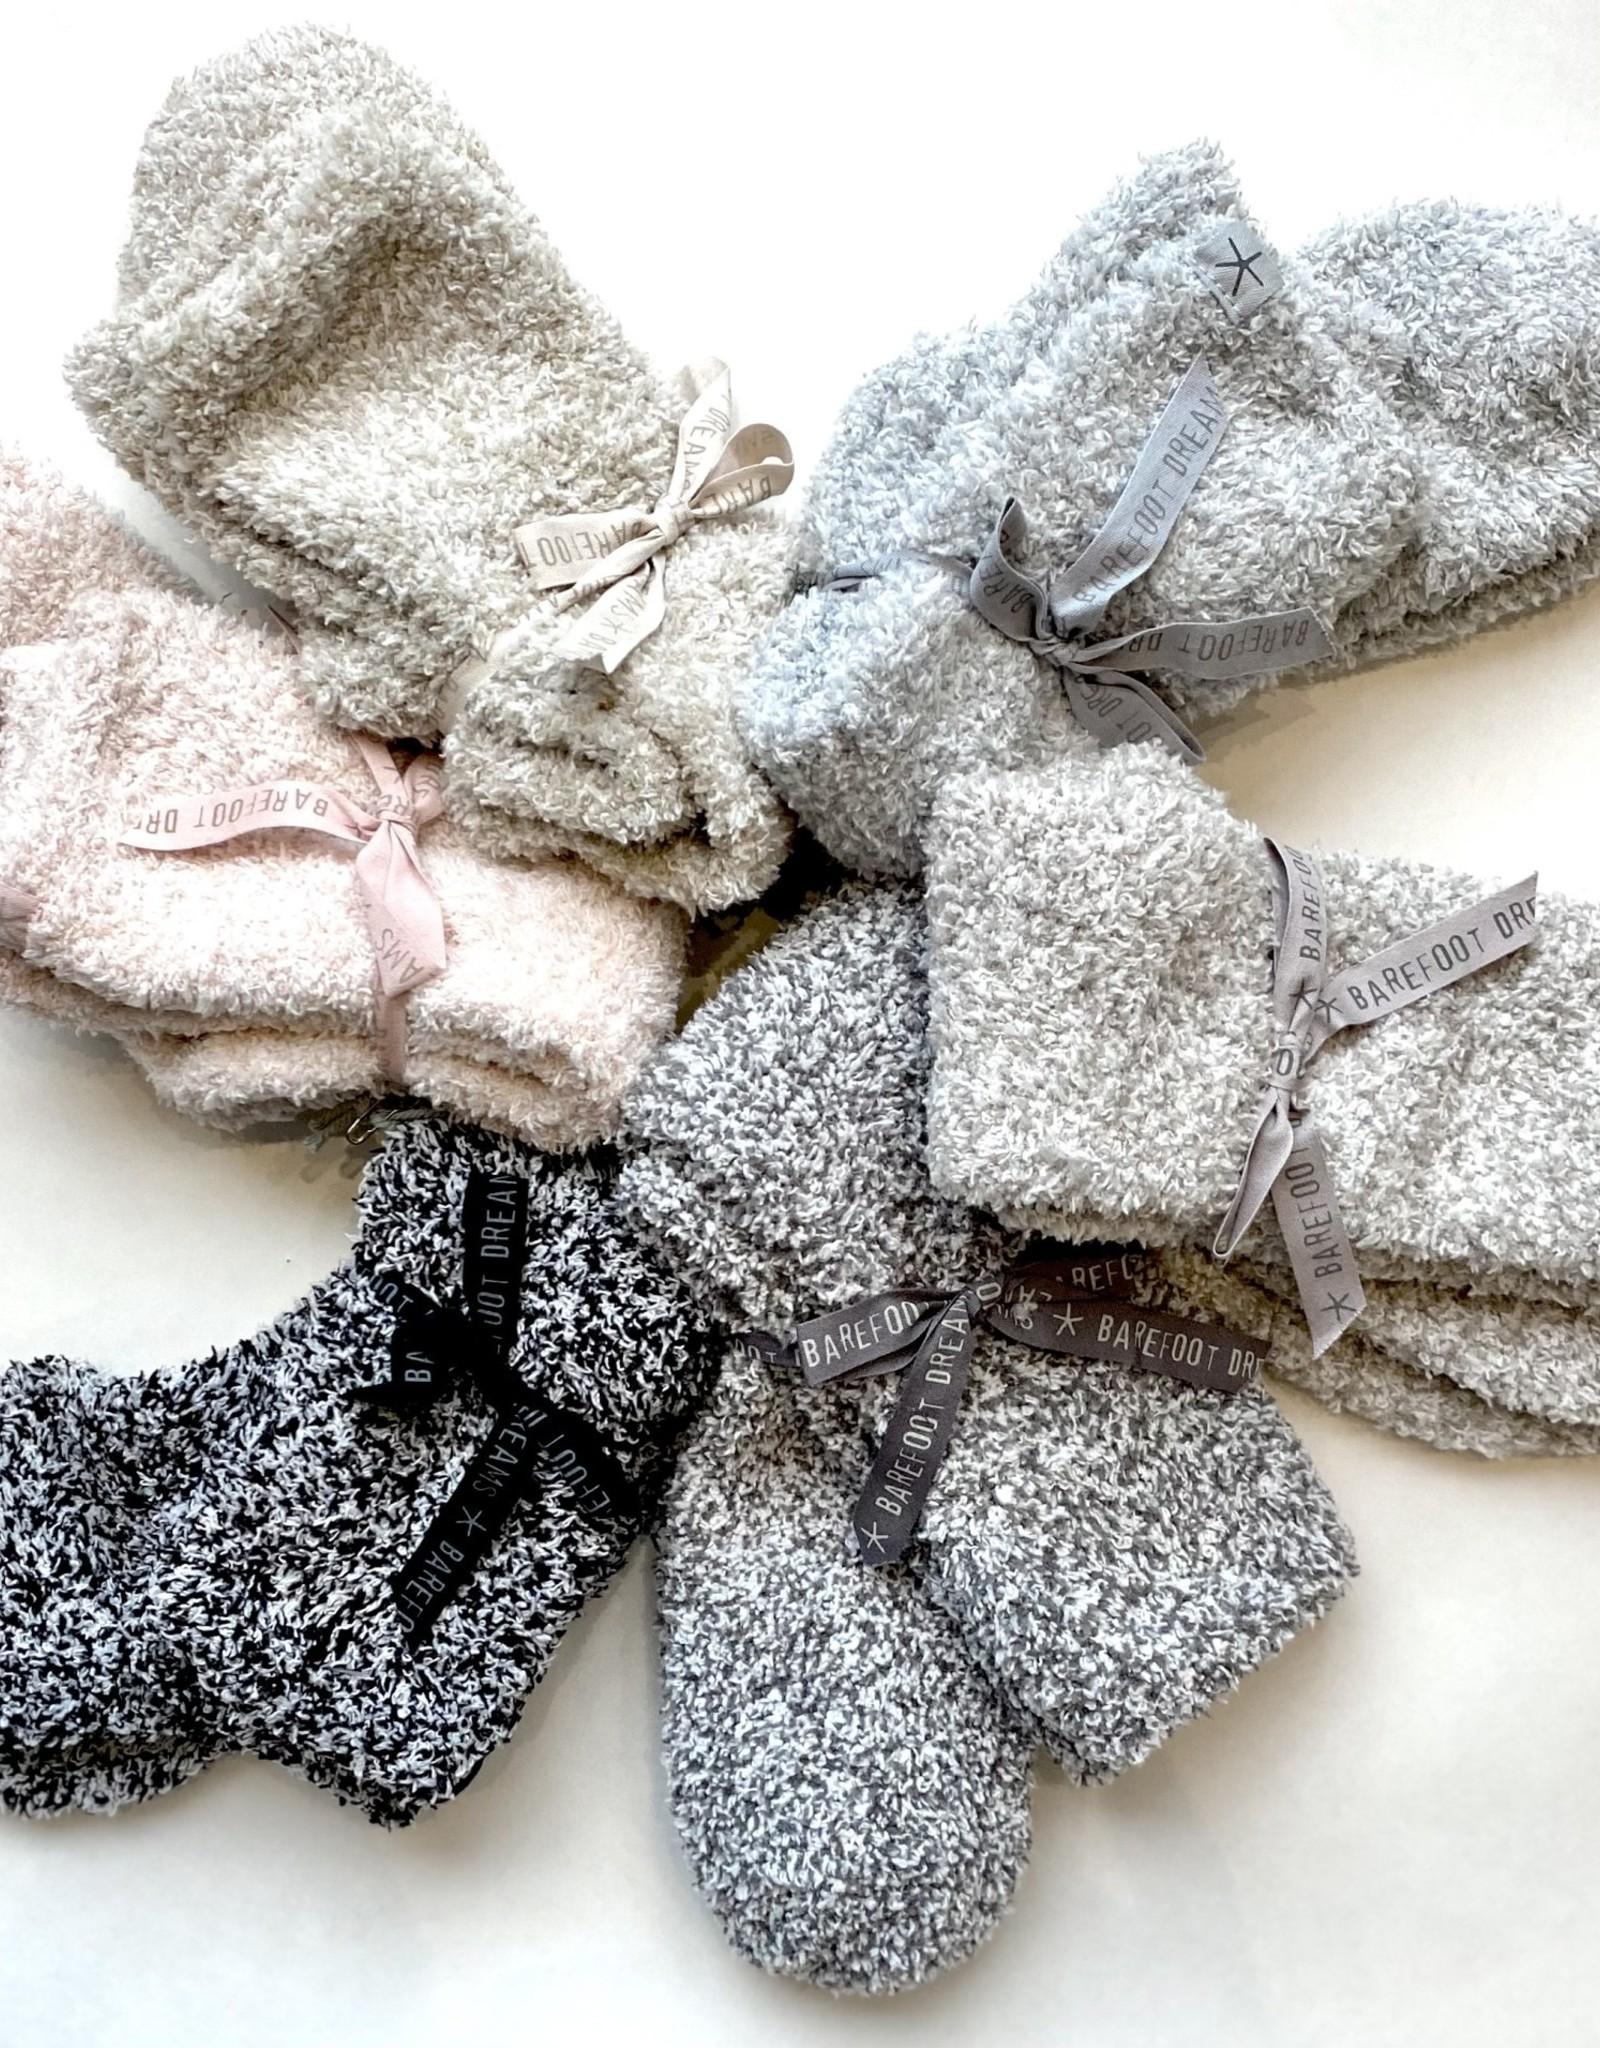 Barefoot Dreams Cozy Chic Women's Socks-Black/White